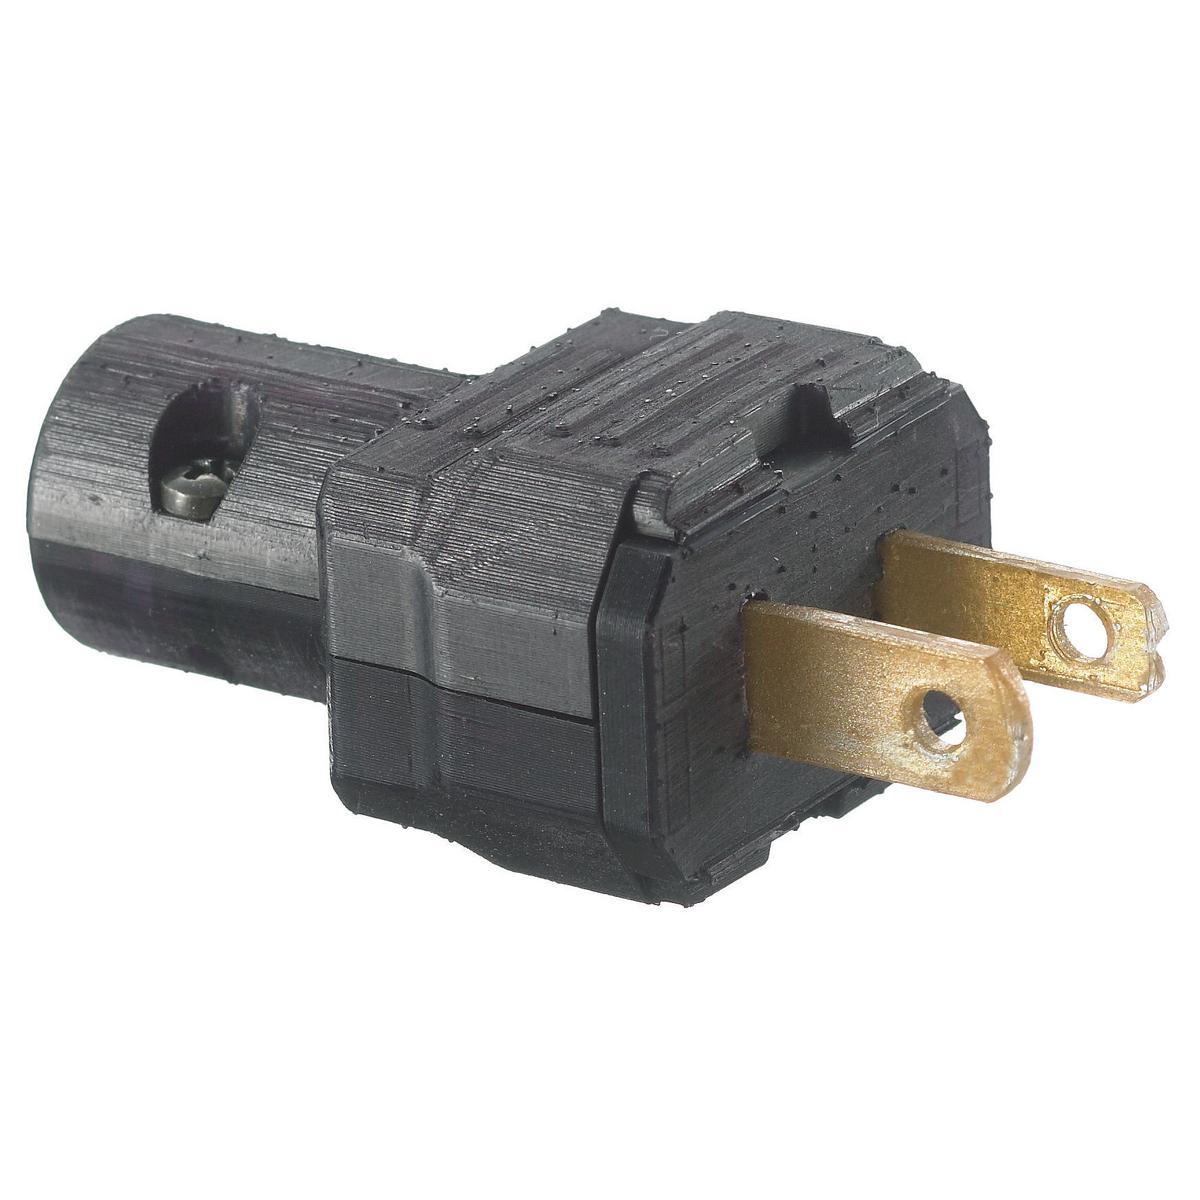 Hubbell RP101BK Plug, 15A 125V, 2W, POLAR, LIGHT DUTY, BK